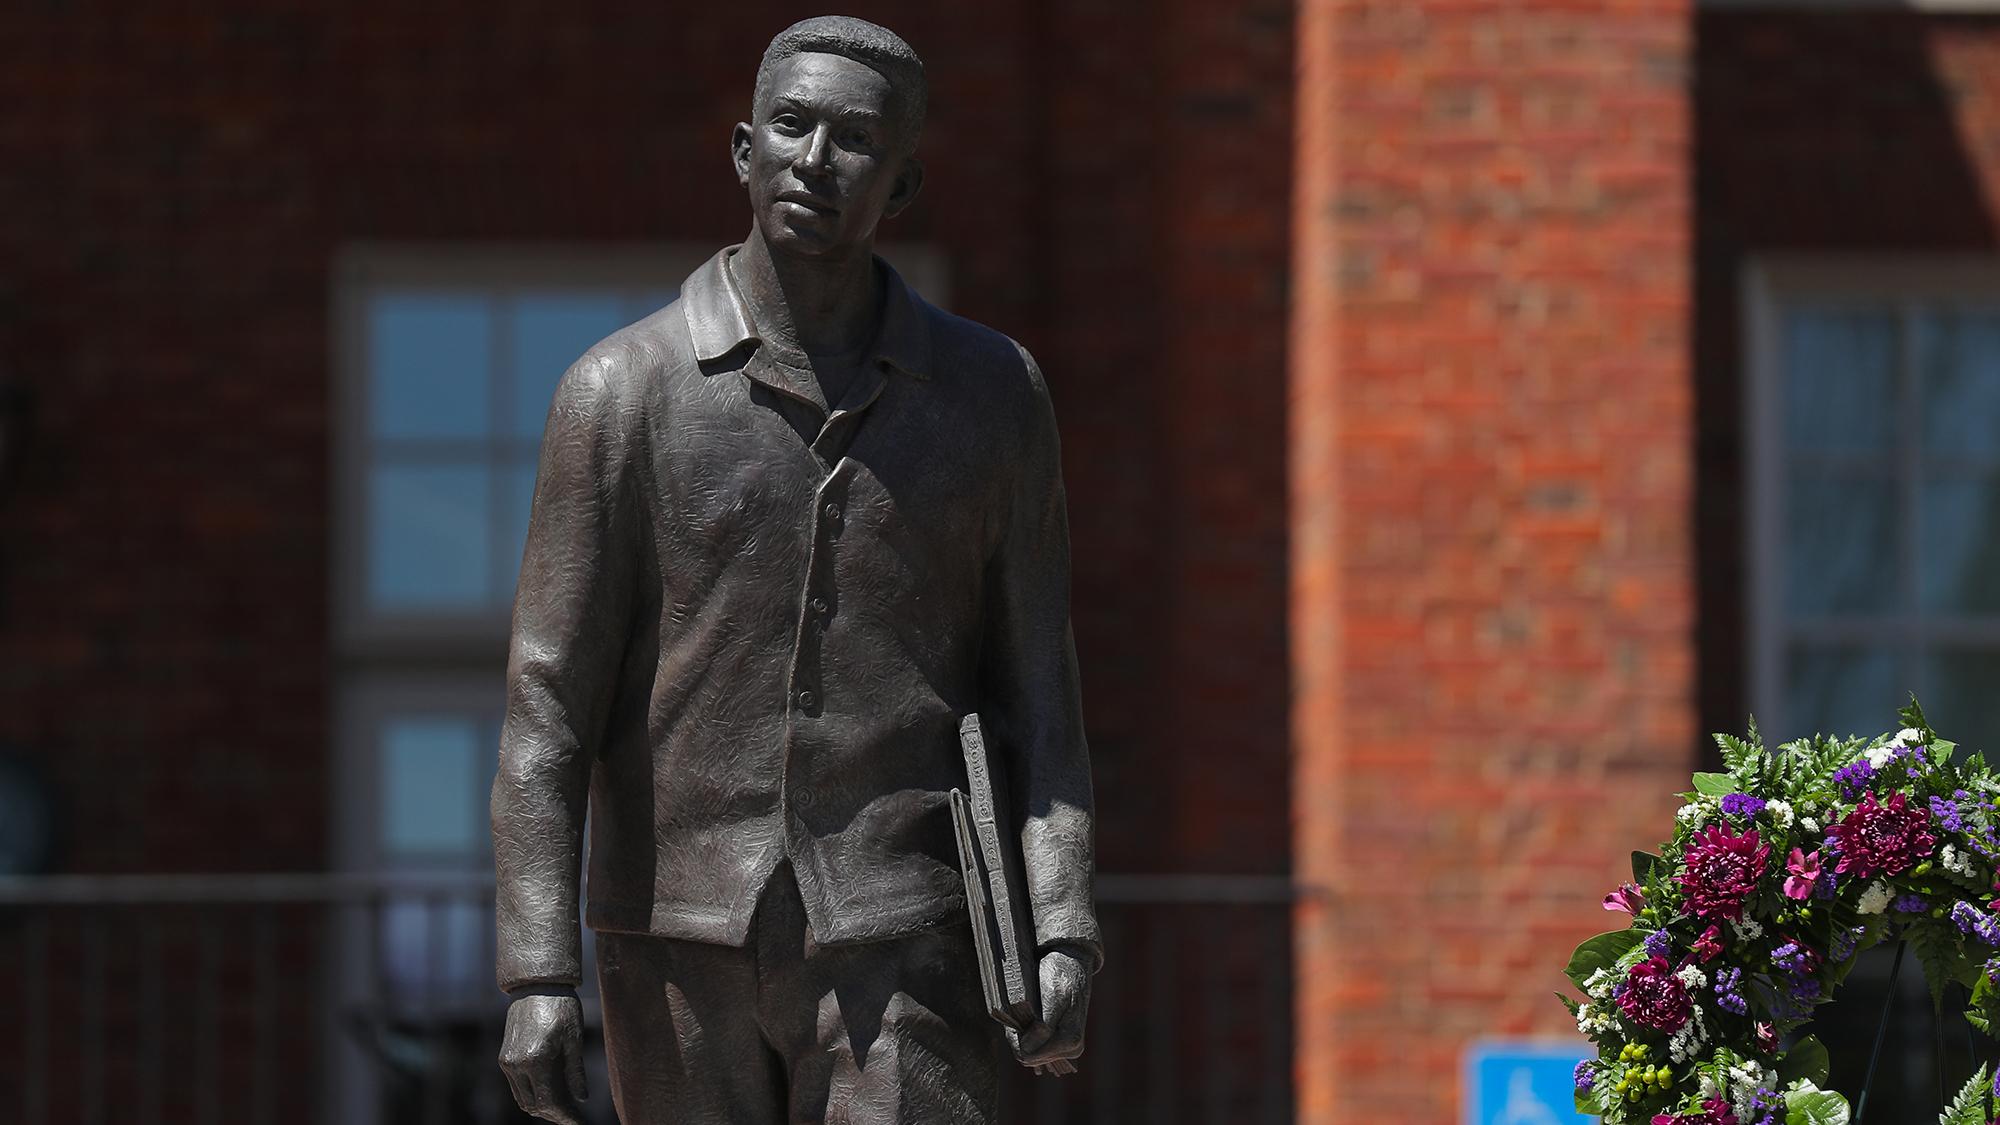 Statue of Joseph Vaughn at Furman University.